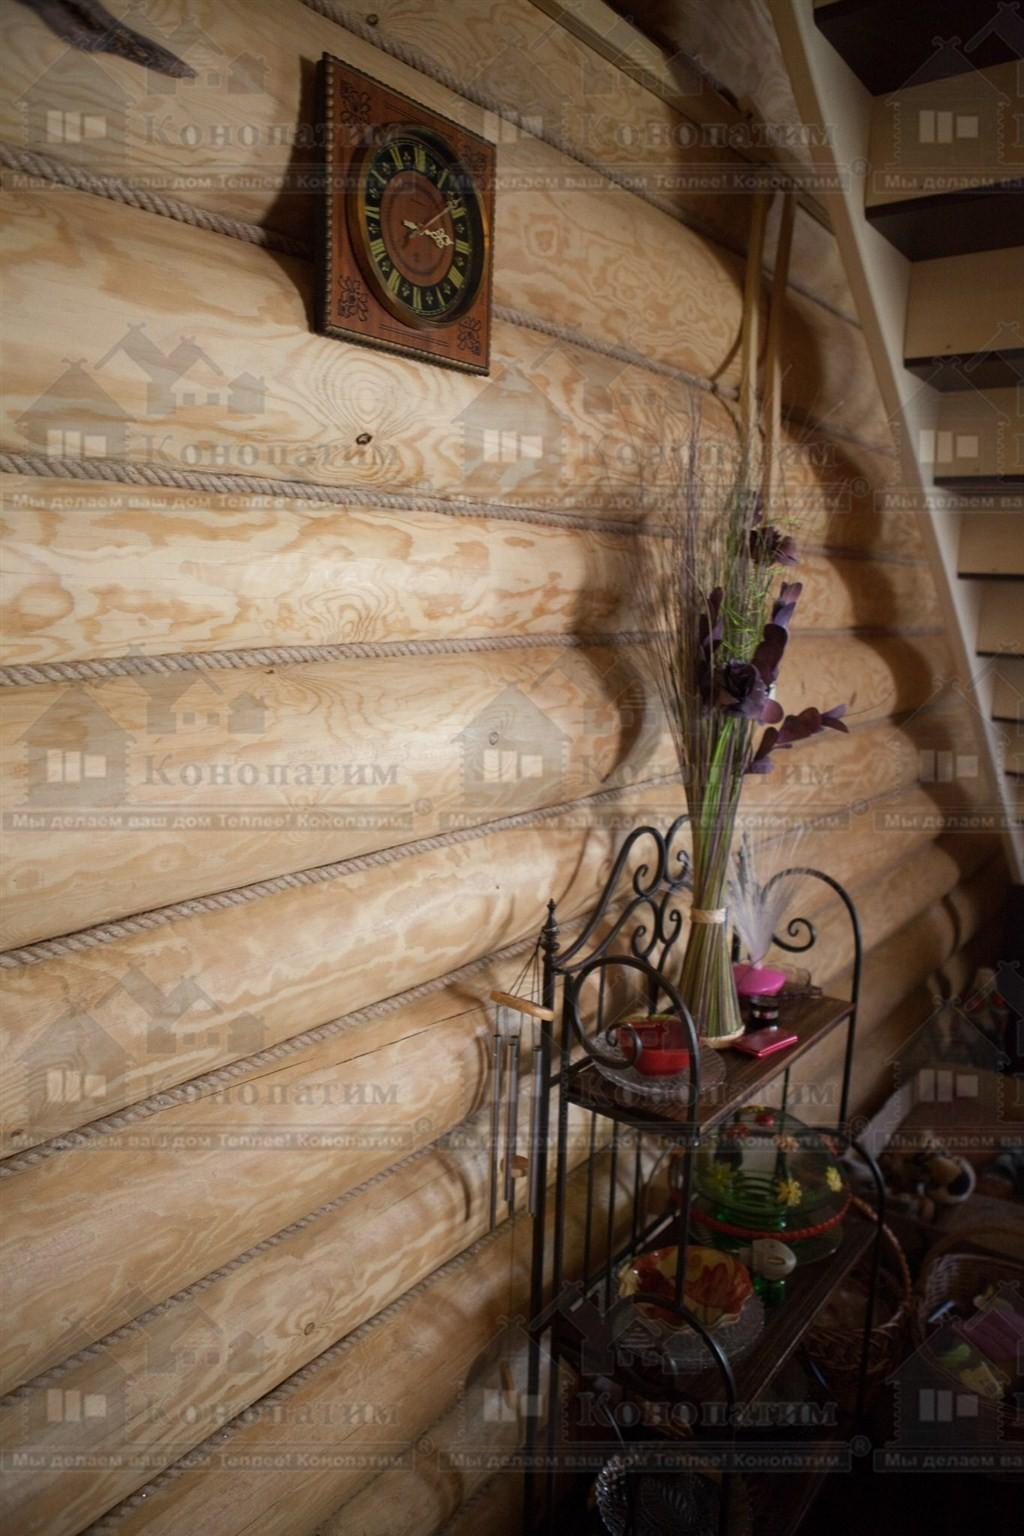 Фото-внутренняя конопатка сруба ручной рубки в районе города Кириши.